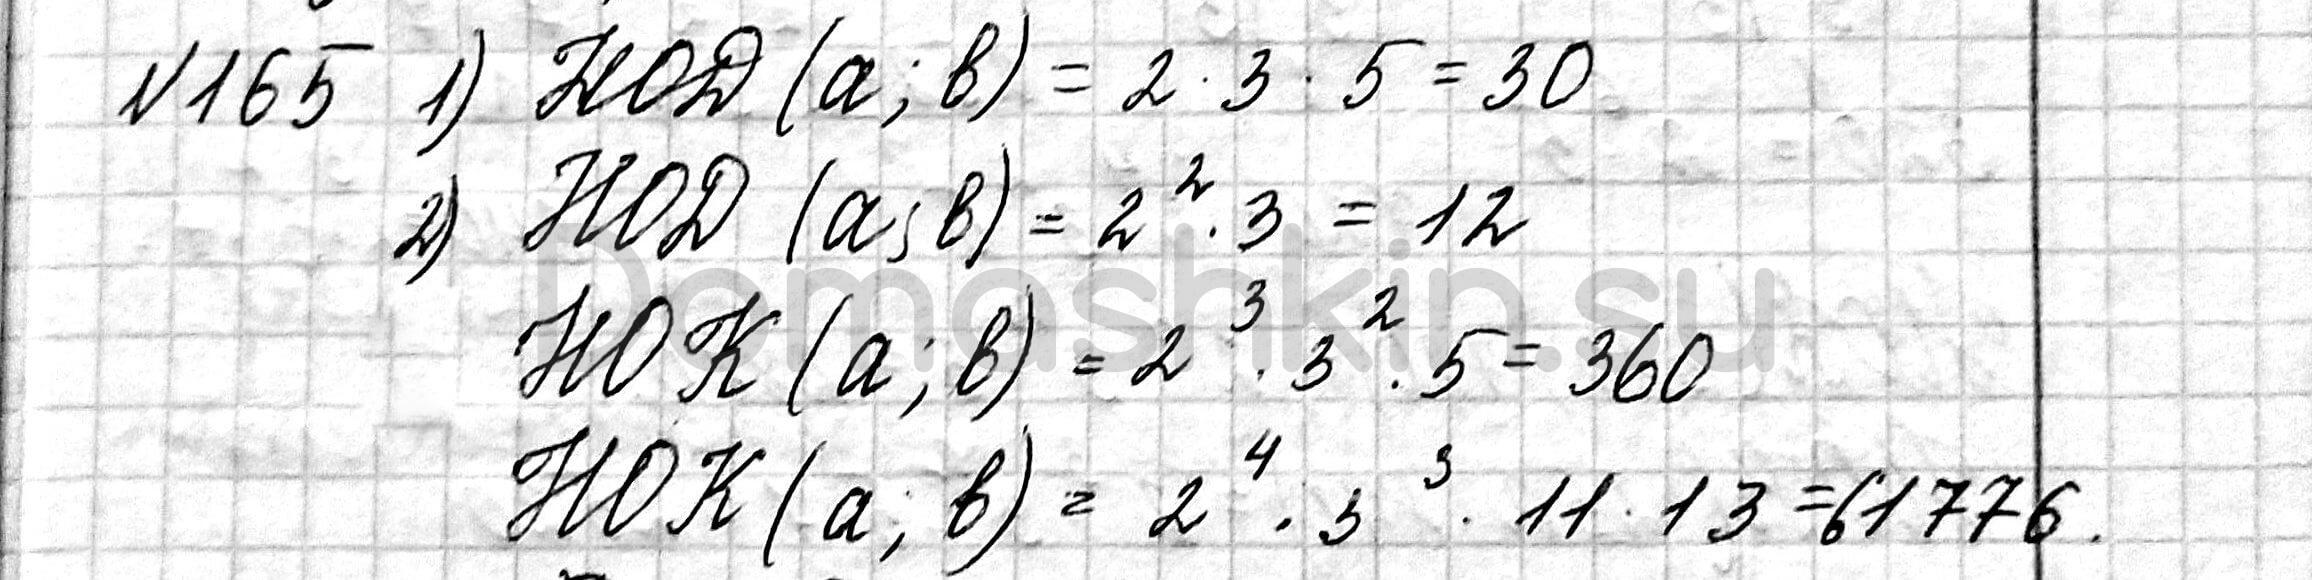 Математика 6 класс учебник Мерзляк номер 165 решение